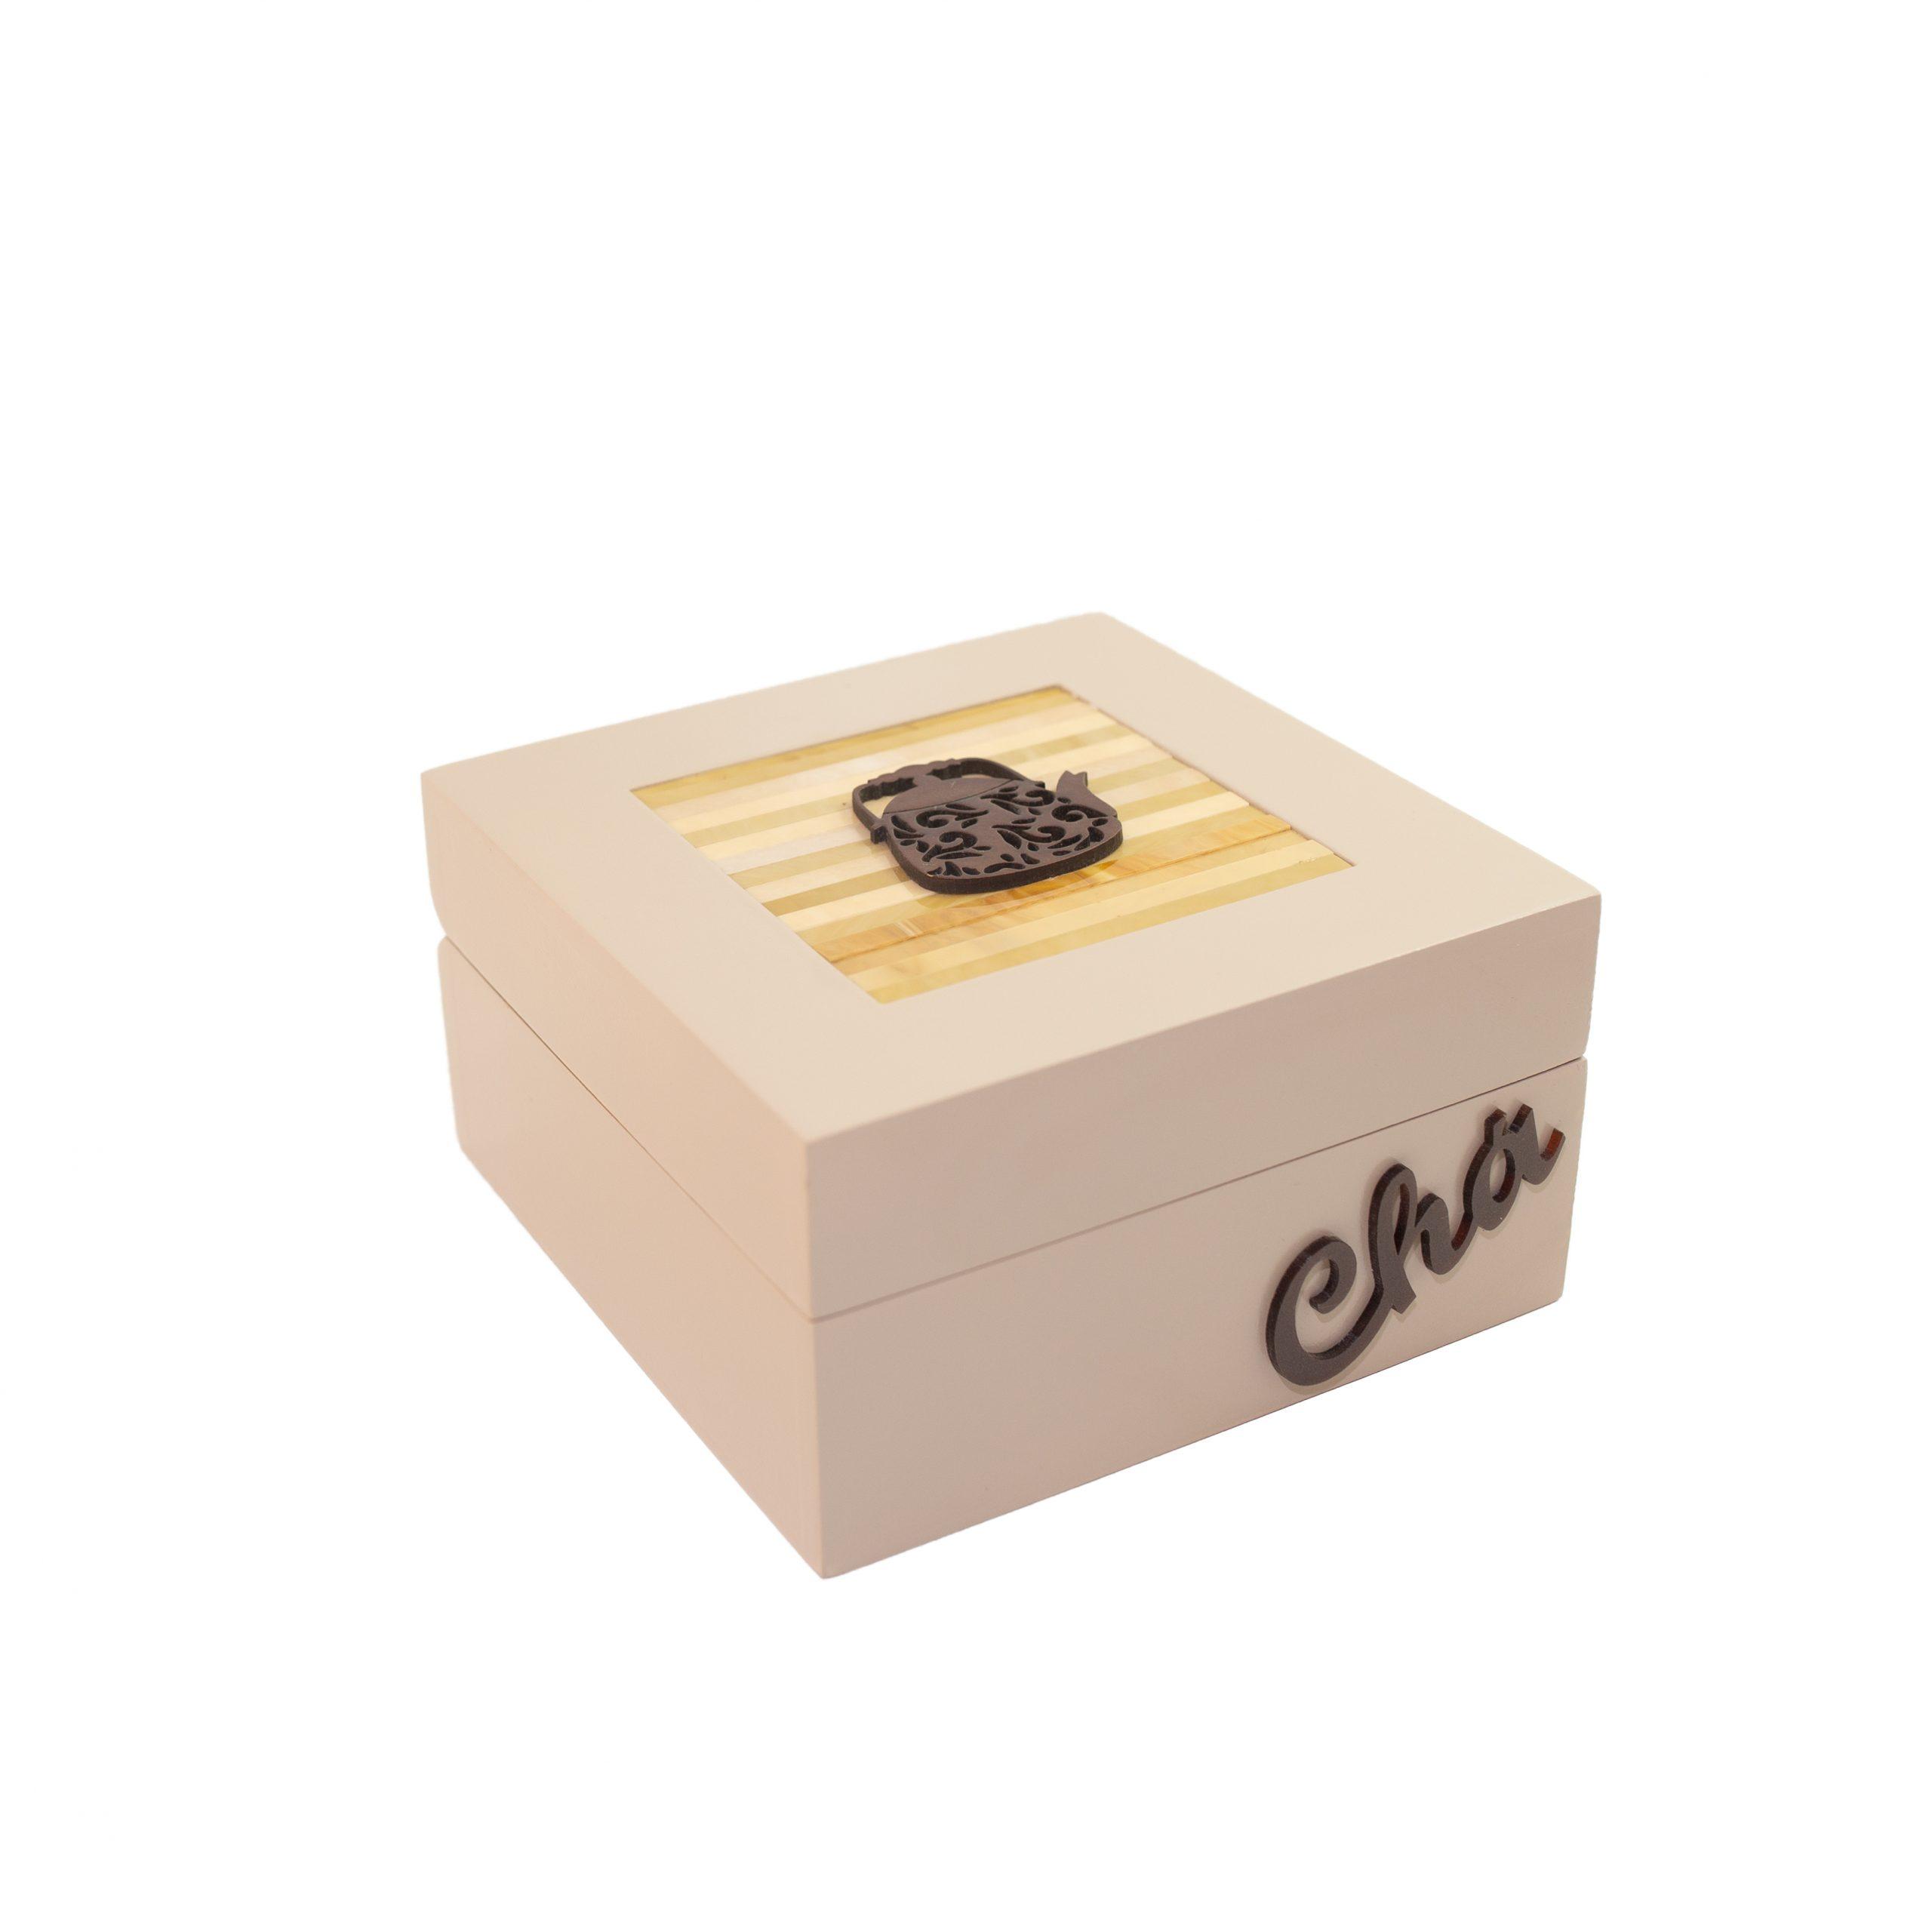 C48-CHA 4-(PORTA CHÁ 4 DIV) NUDE-16X16X8